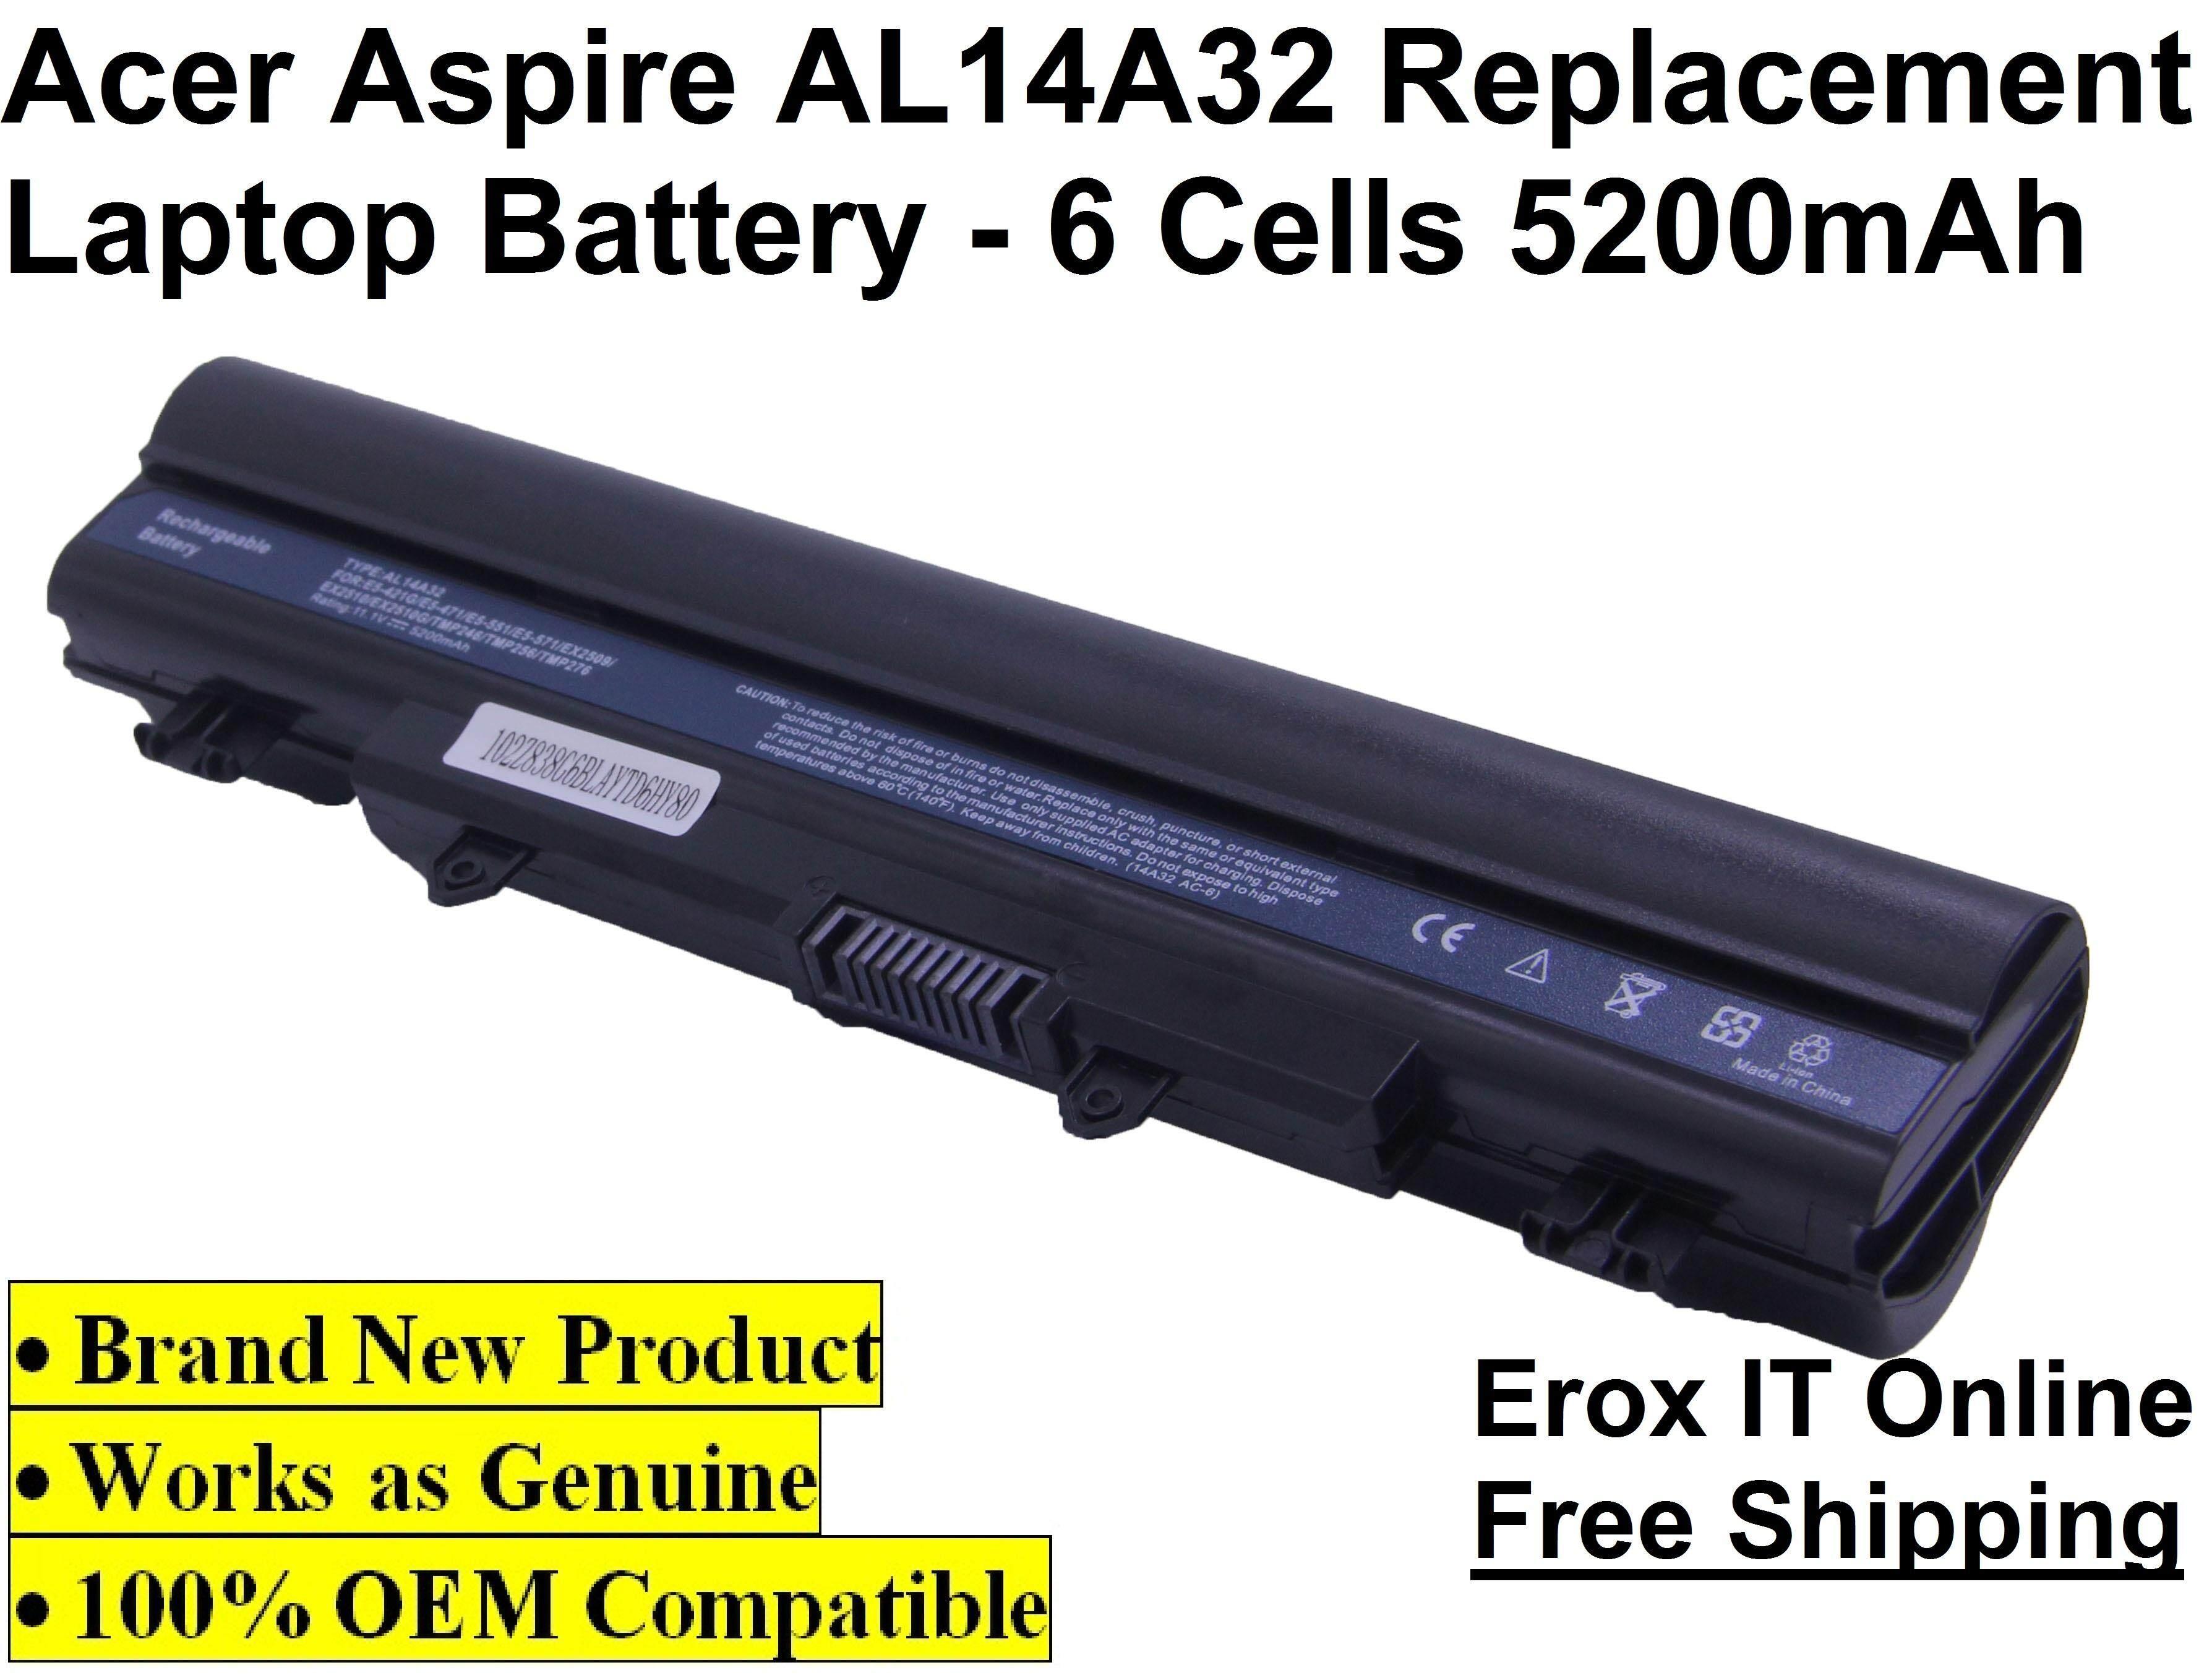 Sell Acer Aspire Az3705 Cheapest Best Quality My Store Keyboard 4752 4752g 4752z 4752zg Myr 84